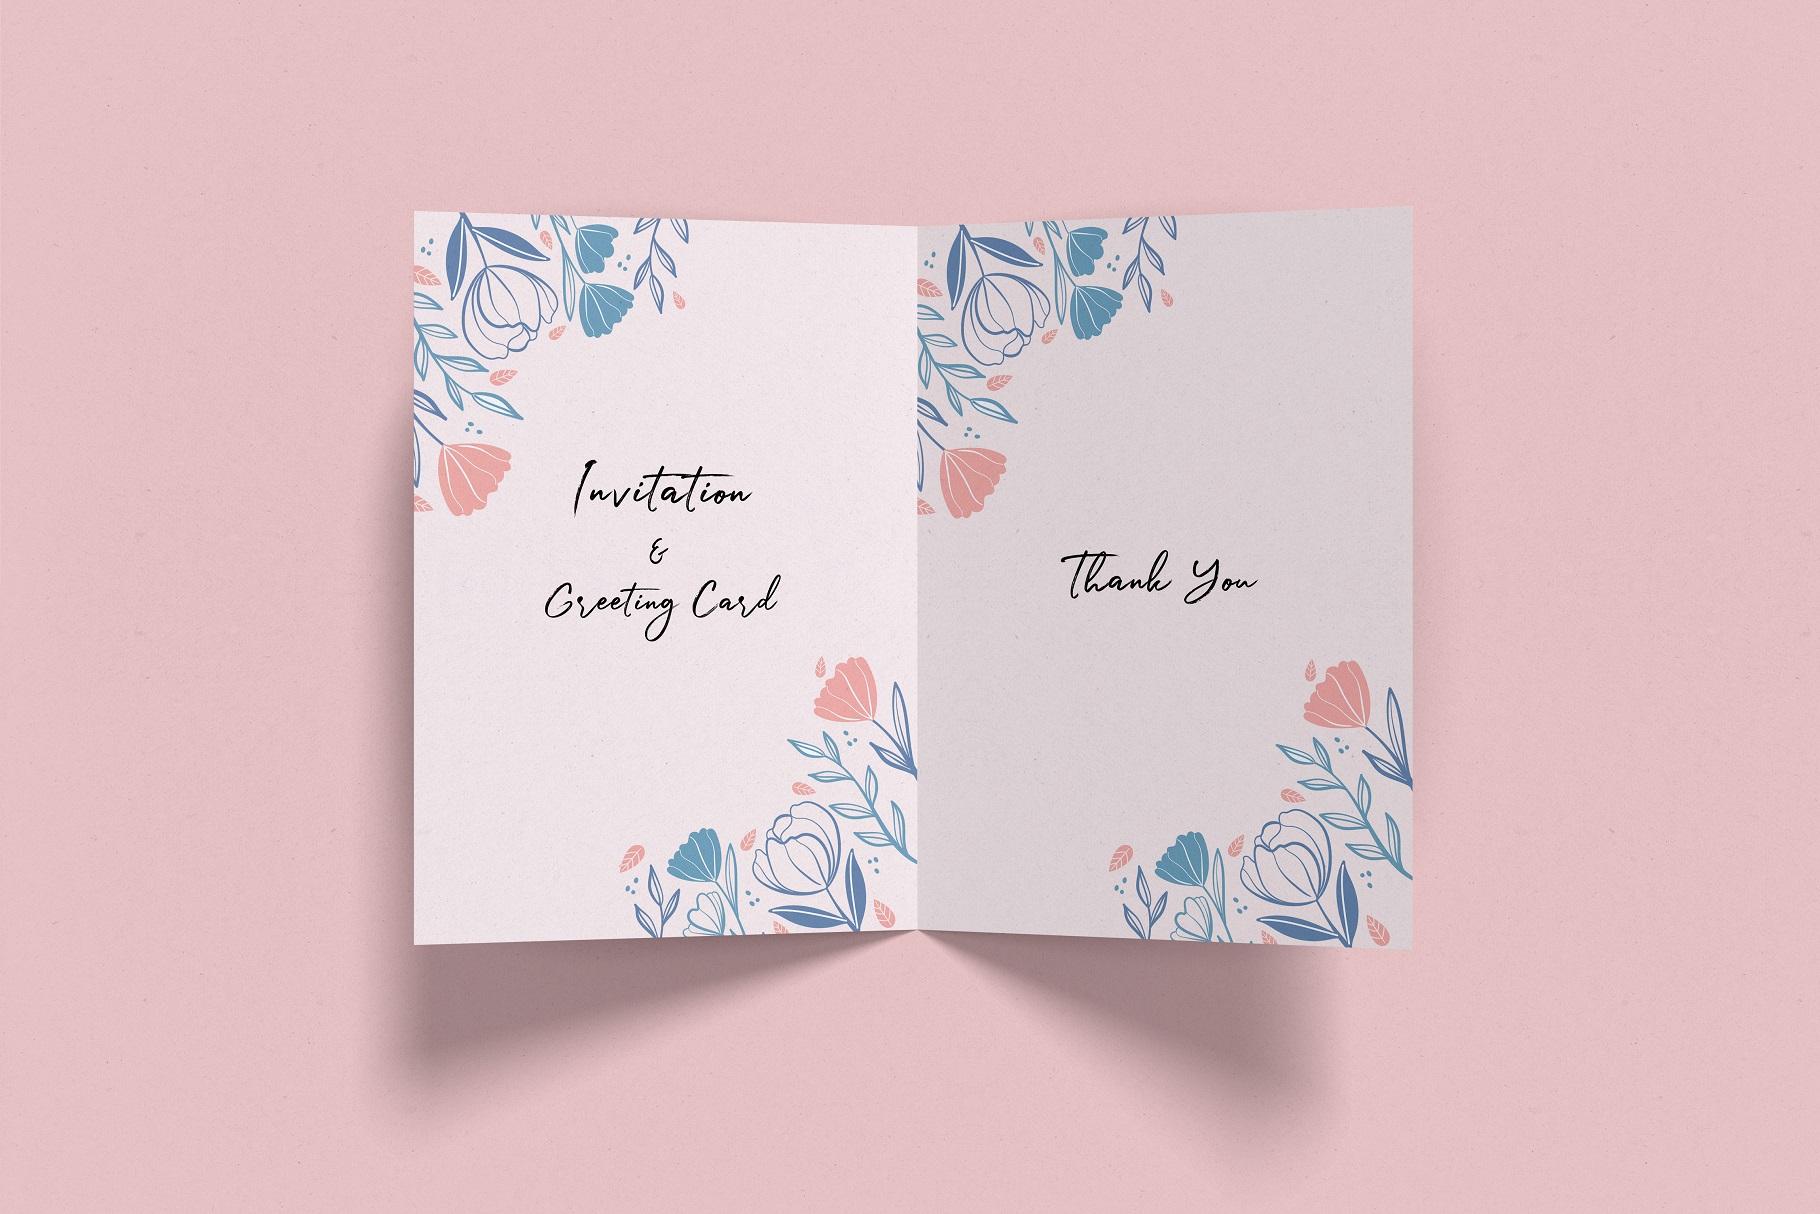 Invitation & Greeting Card Mockup example image 2